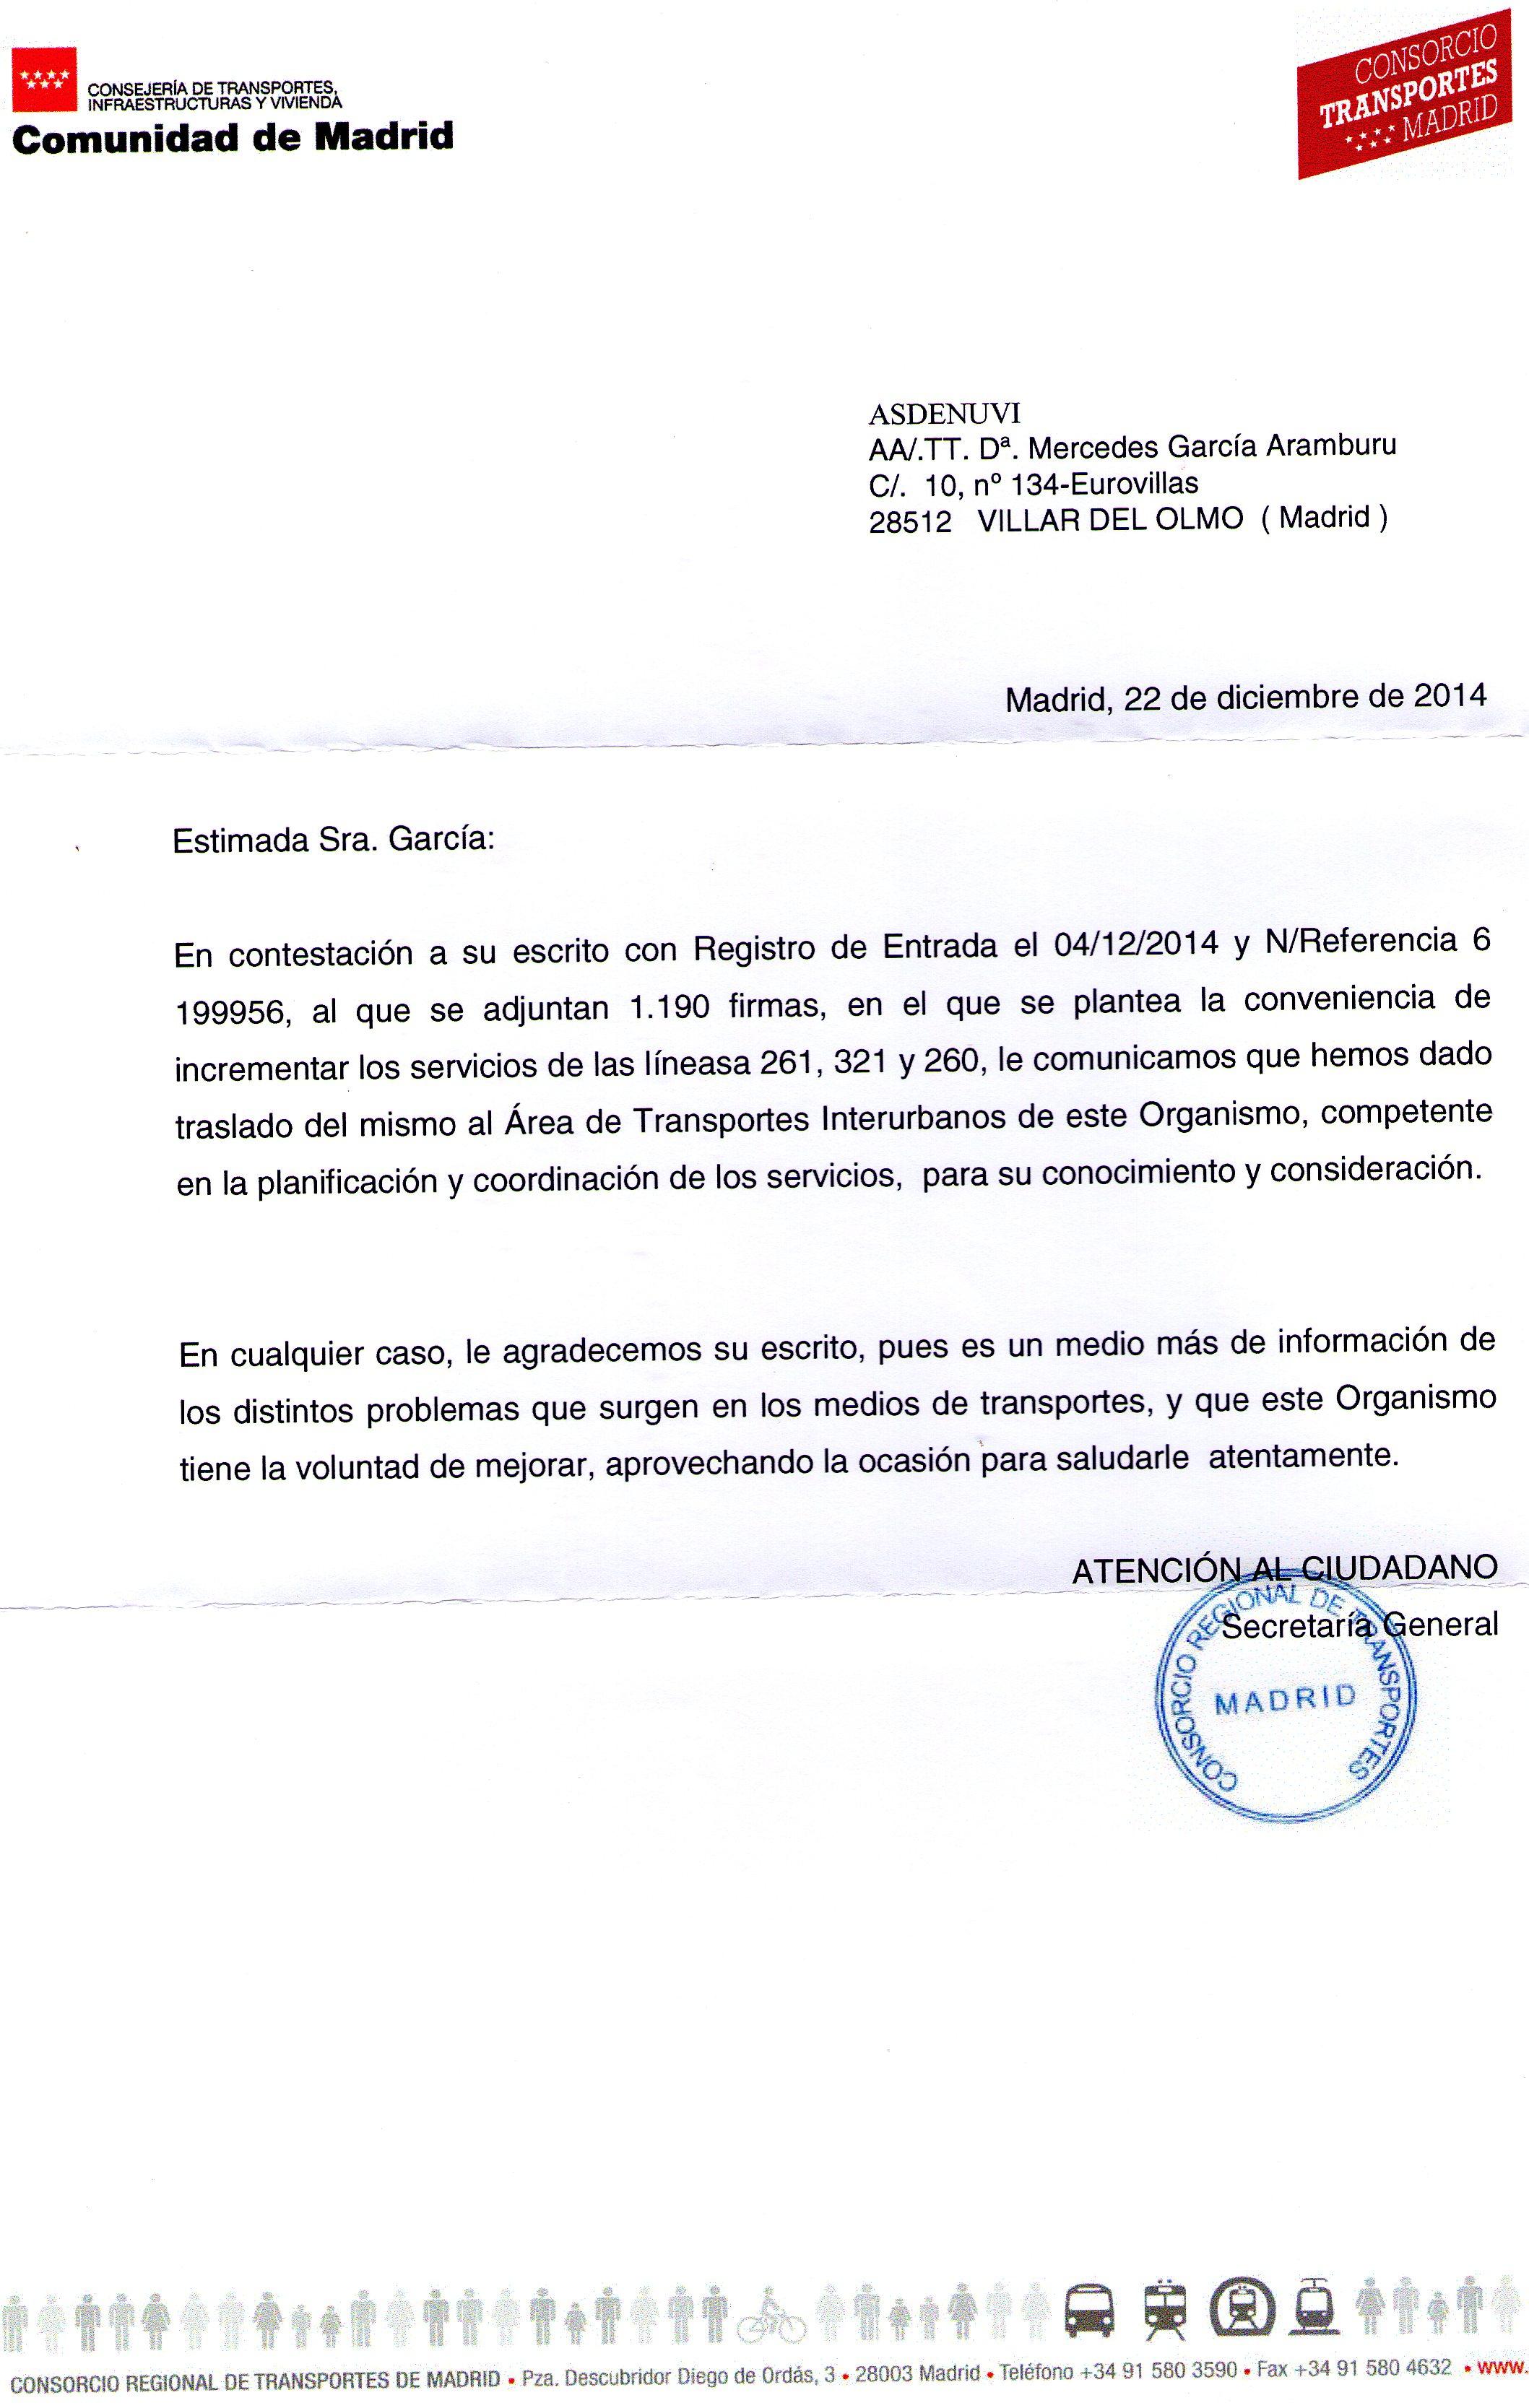 Comunidad aut noma de madrid asdenuvi for Oficina del consorcio de transportes de madrid